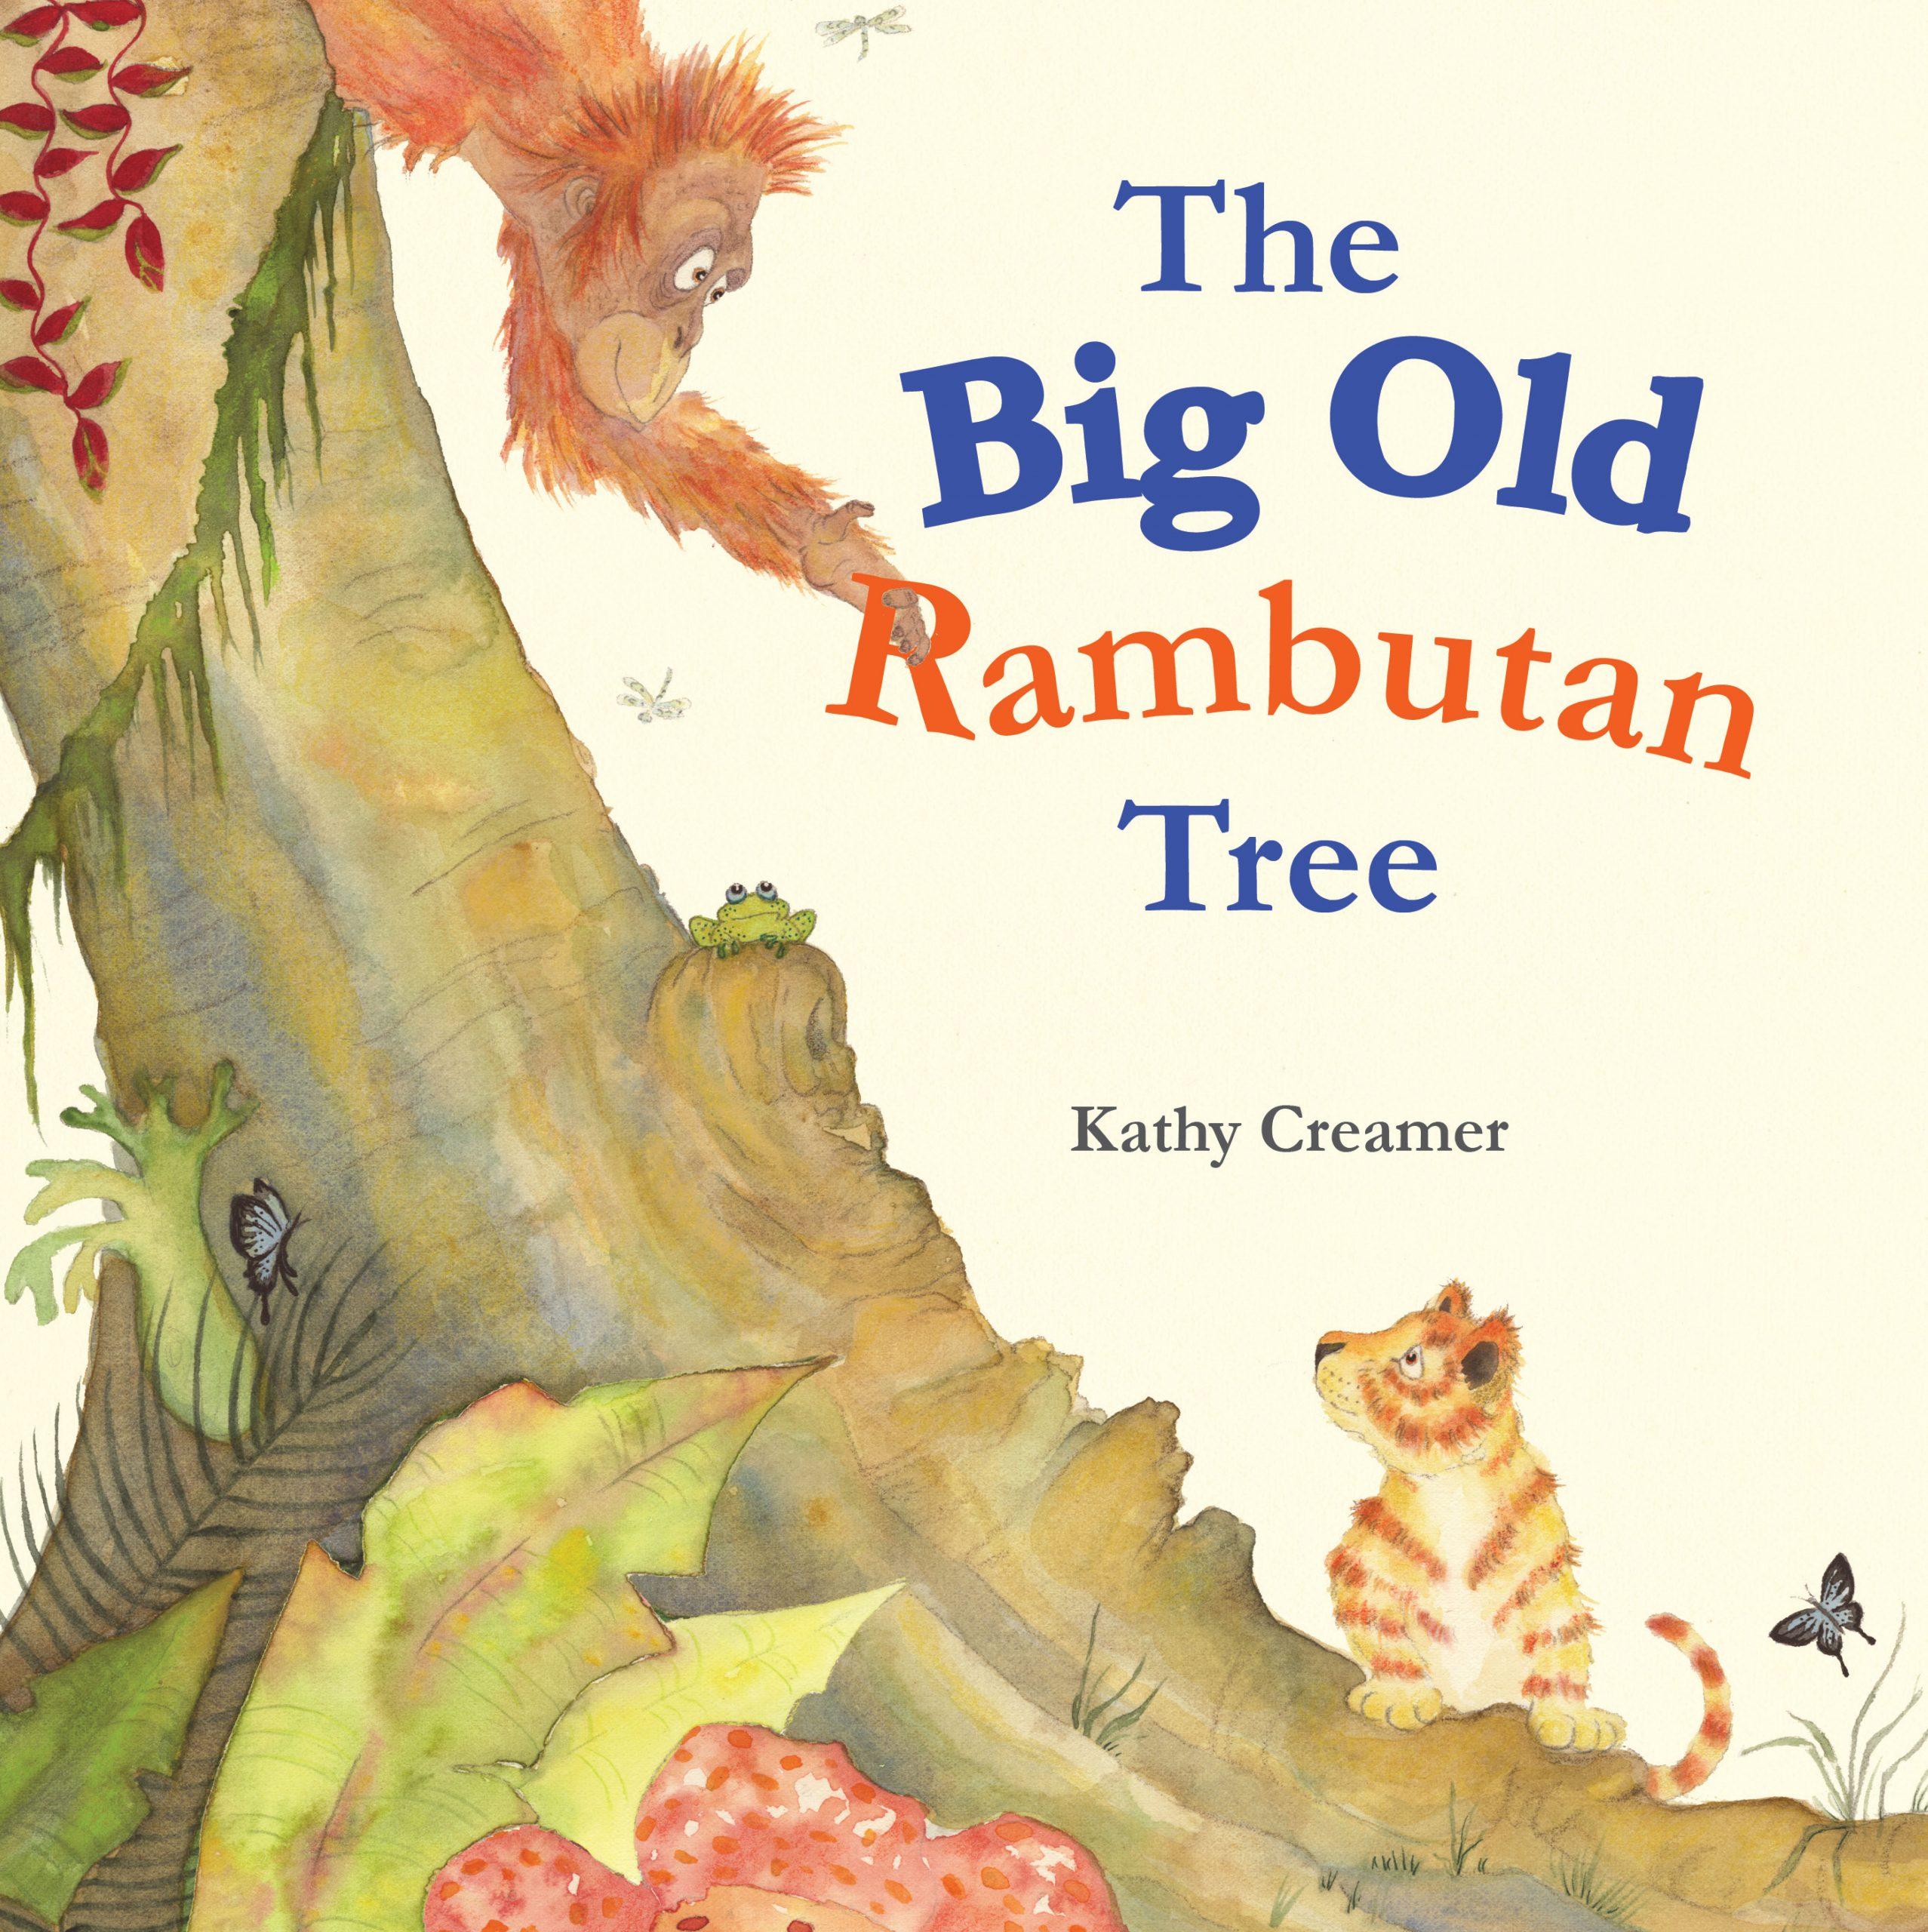 The Big Old Rambutan Tree